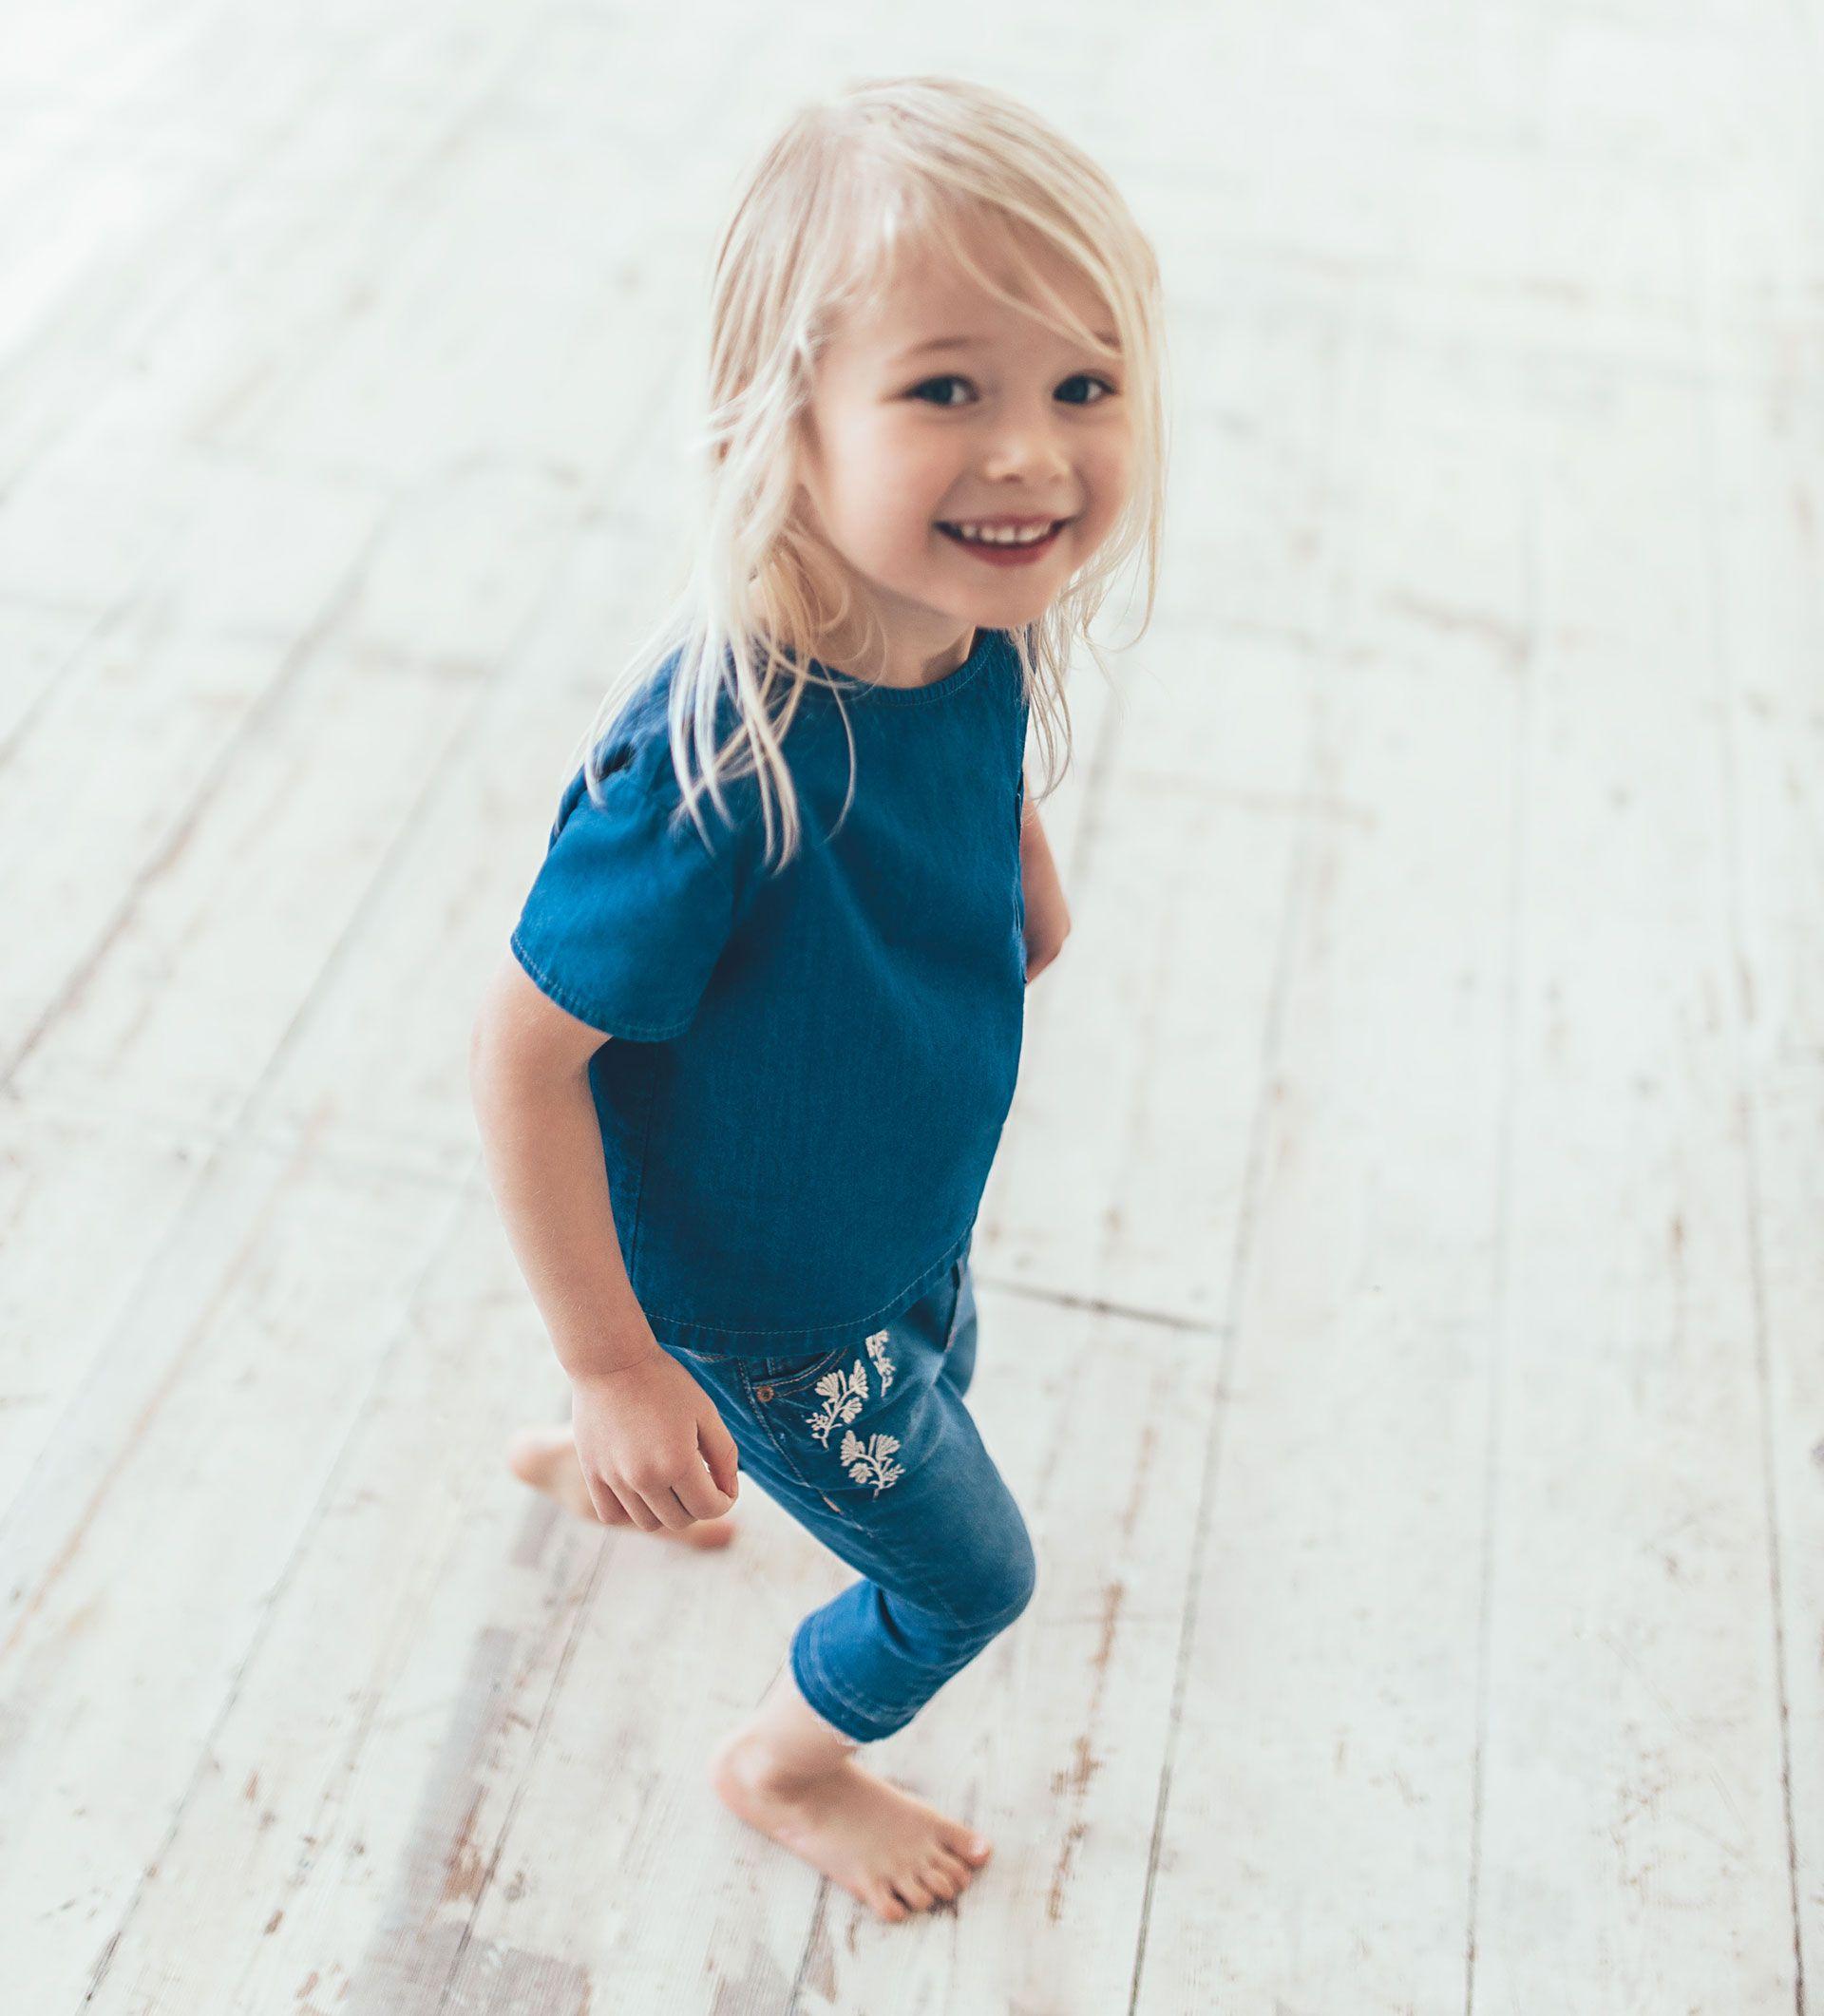 ZARA - ENFANTS - | Zara kids | Pinterest | Zara y Chicas